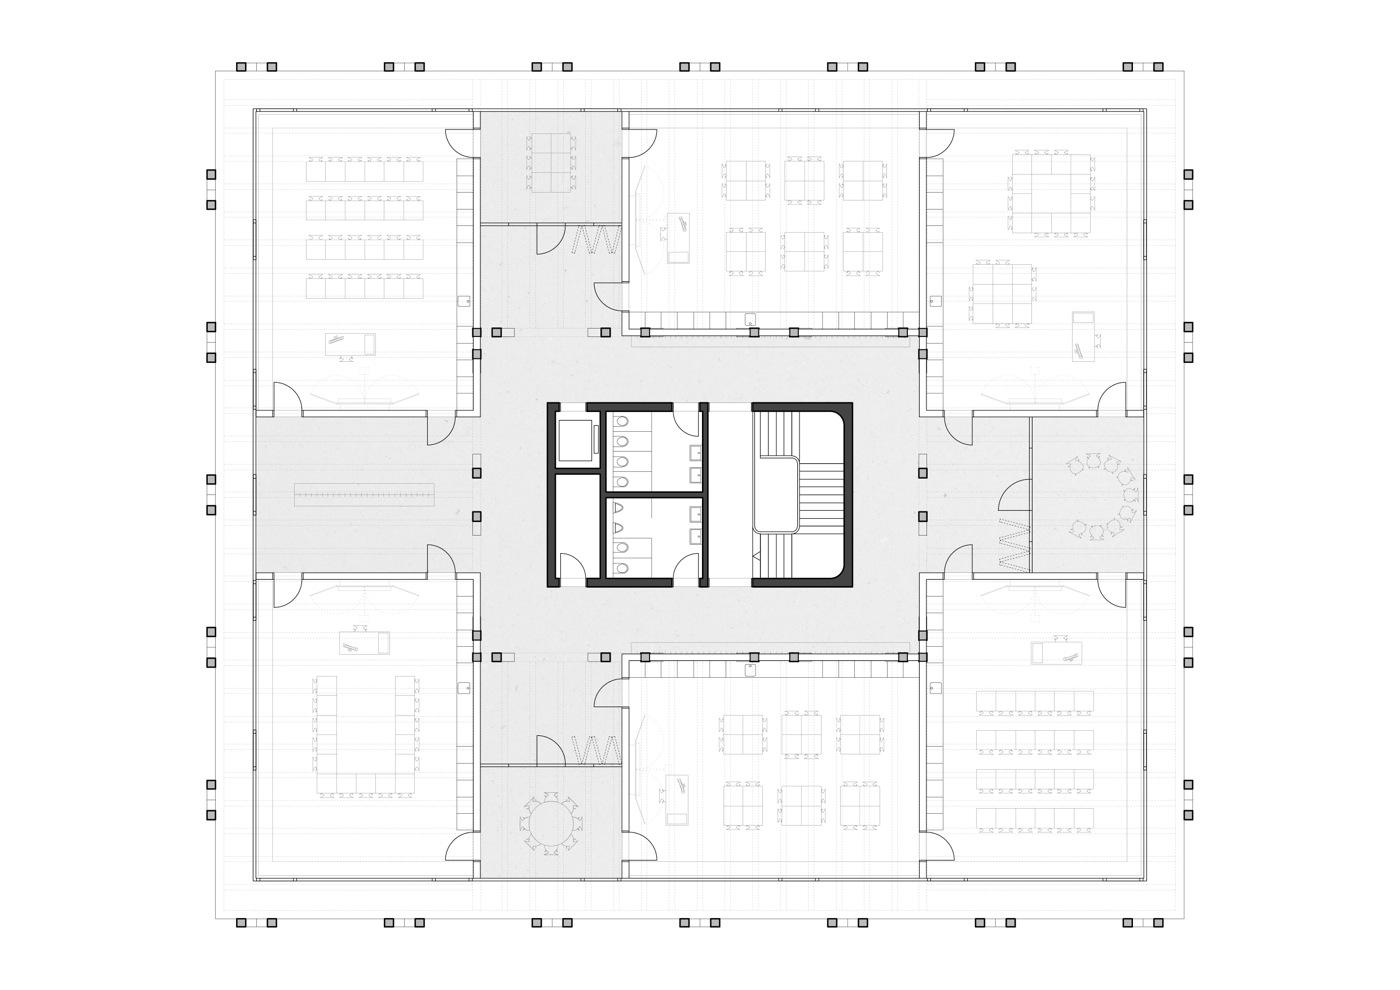 buan-architekten-ersatzneubau schulhaus zentrum-diessenhofen-grundriss-dachgeschoss